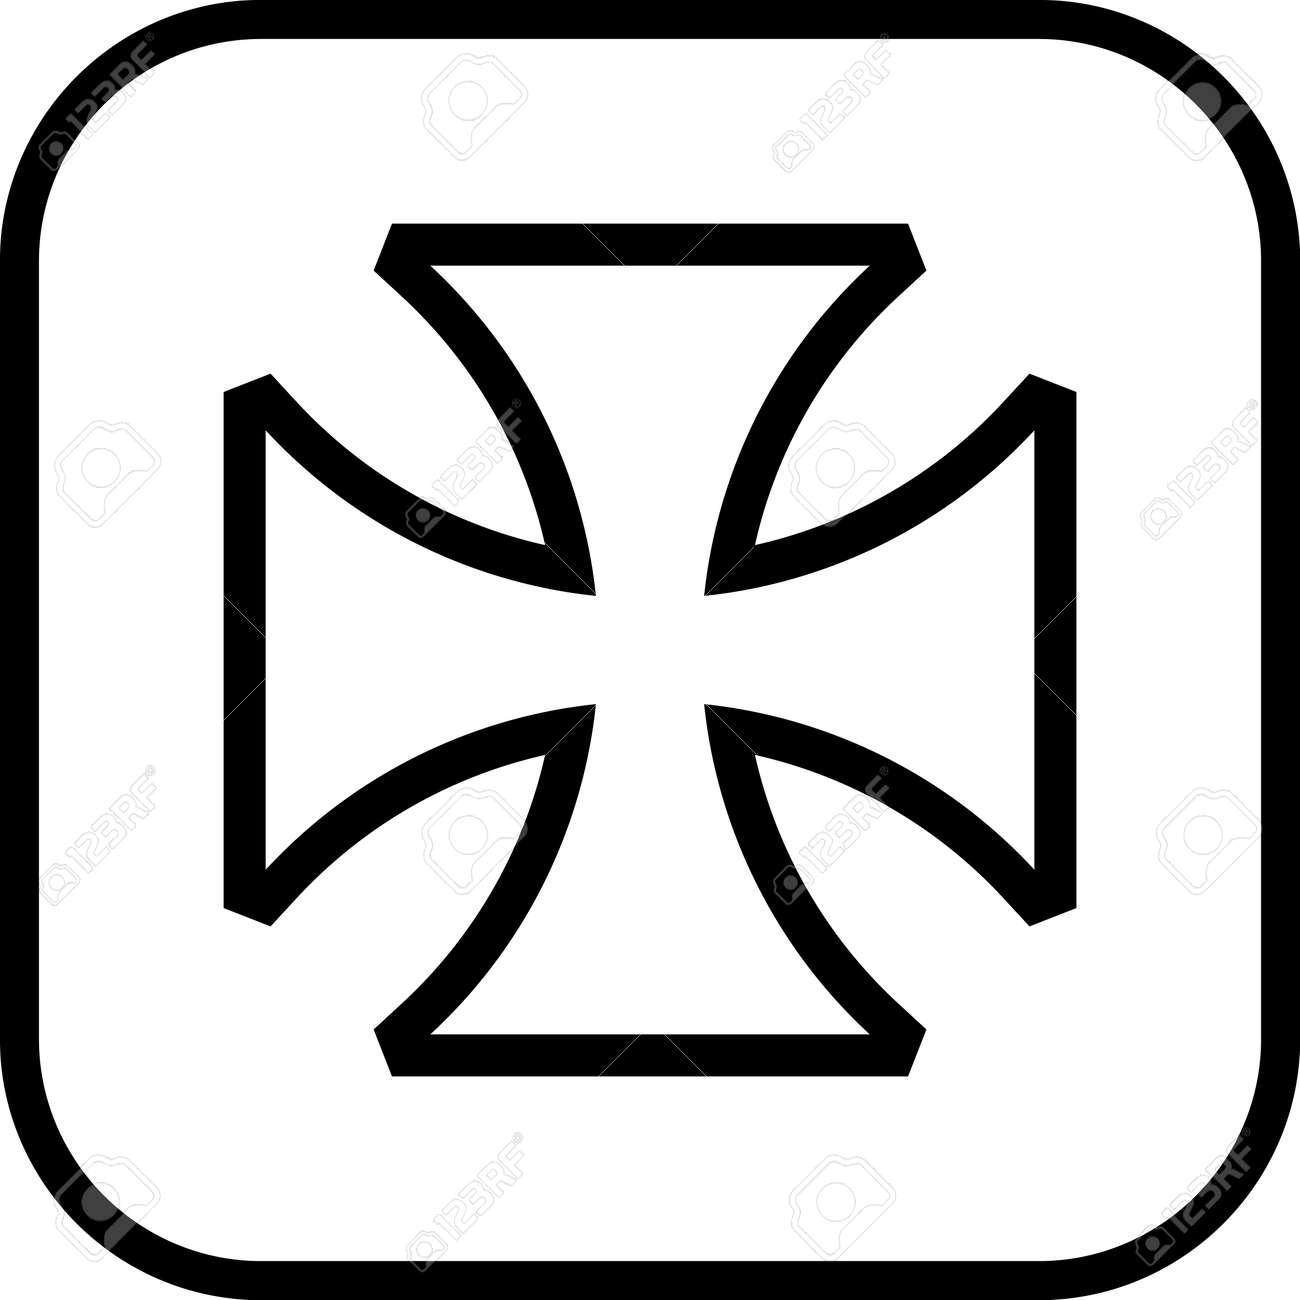 maltese cross vector icon royalty free cliparts vectors and stock rh 123rf com maltese cross vector free maltese cross vector outline